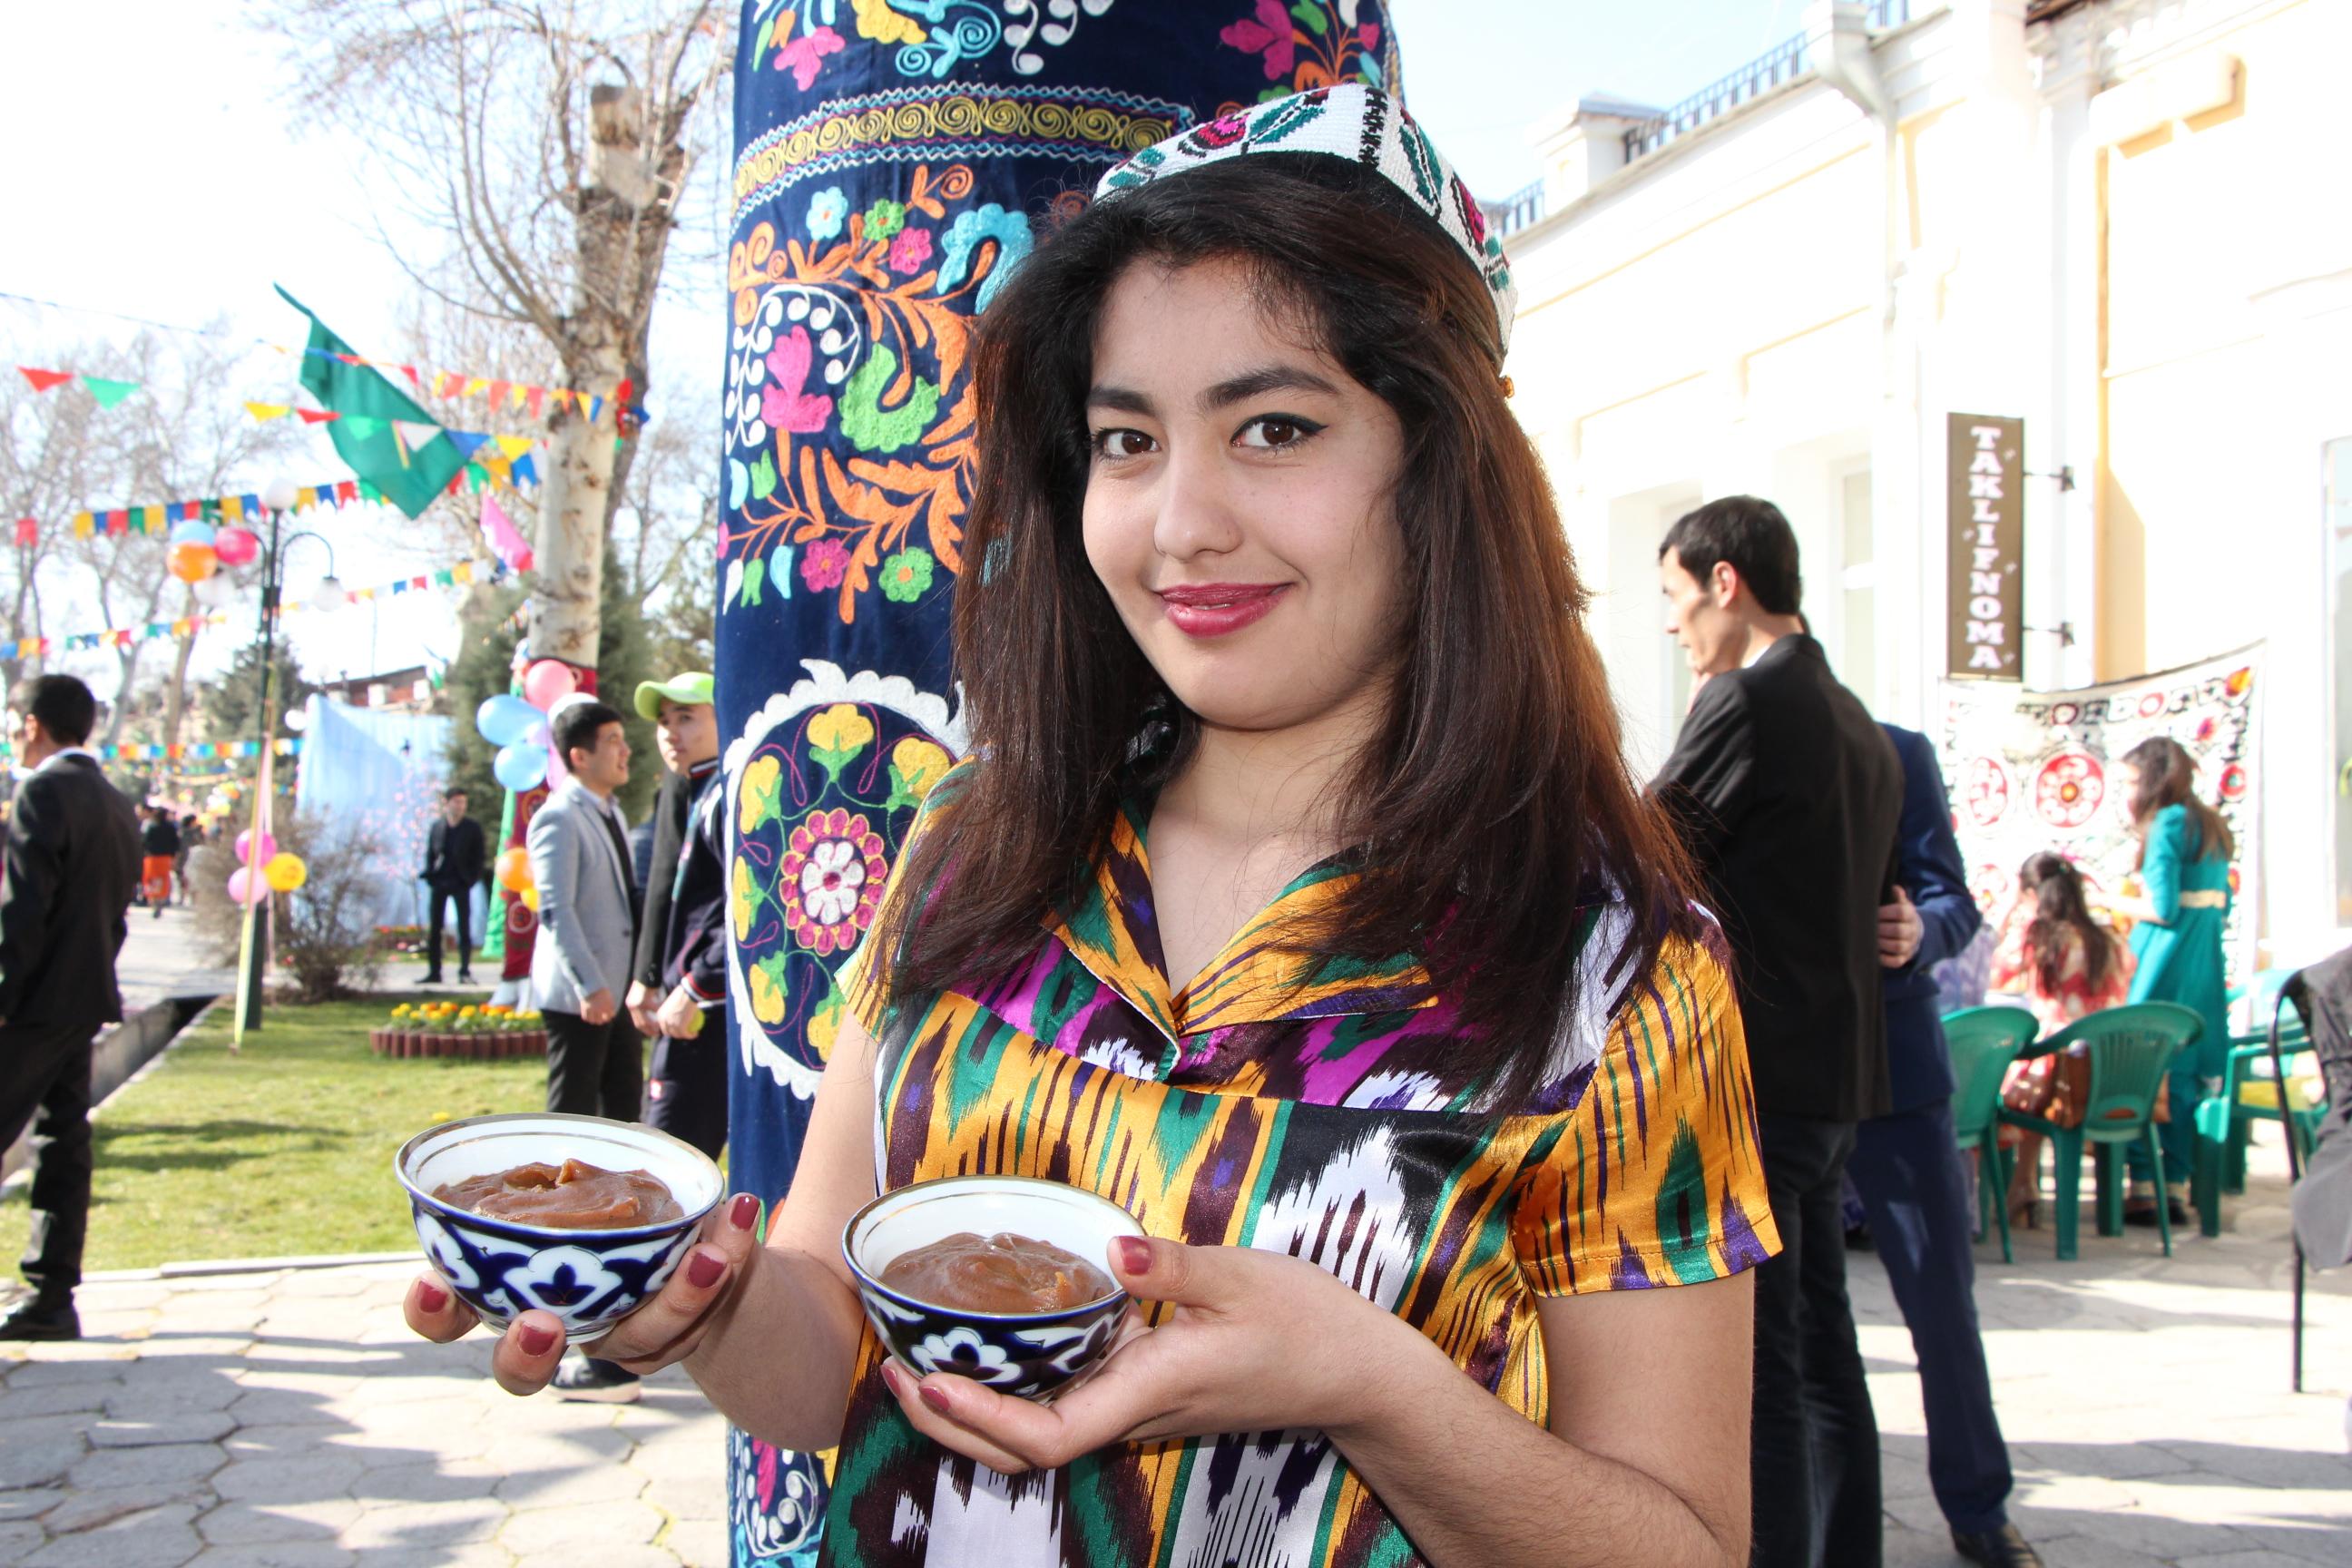 navruz in uzbekistan essay Navruz in uzbekistan essay en essayant en anglais recherche the passing of grandison summary analysis essay list of metaphors about happiness essay 30 septembre 2018.